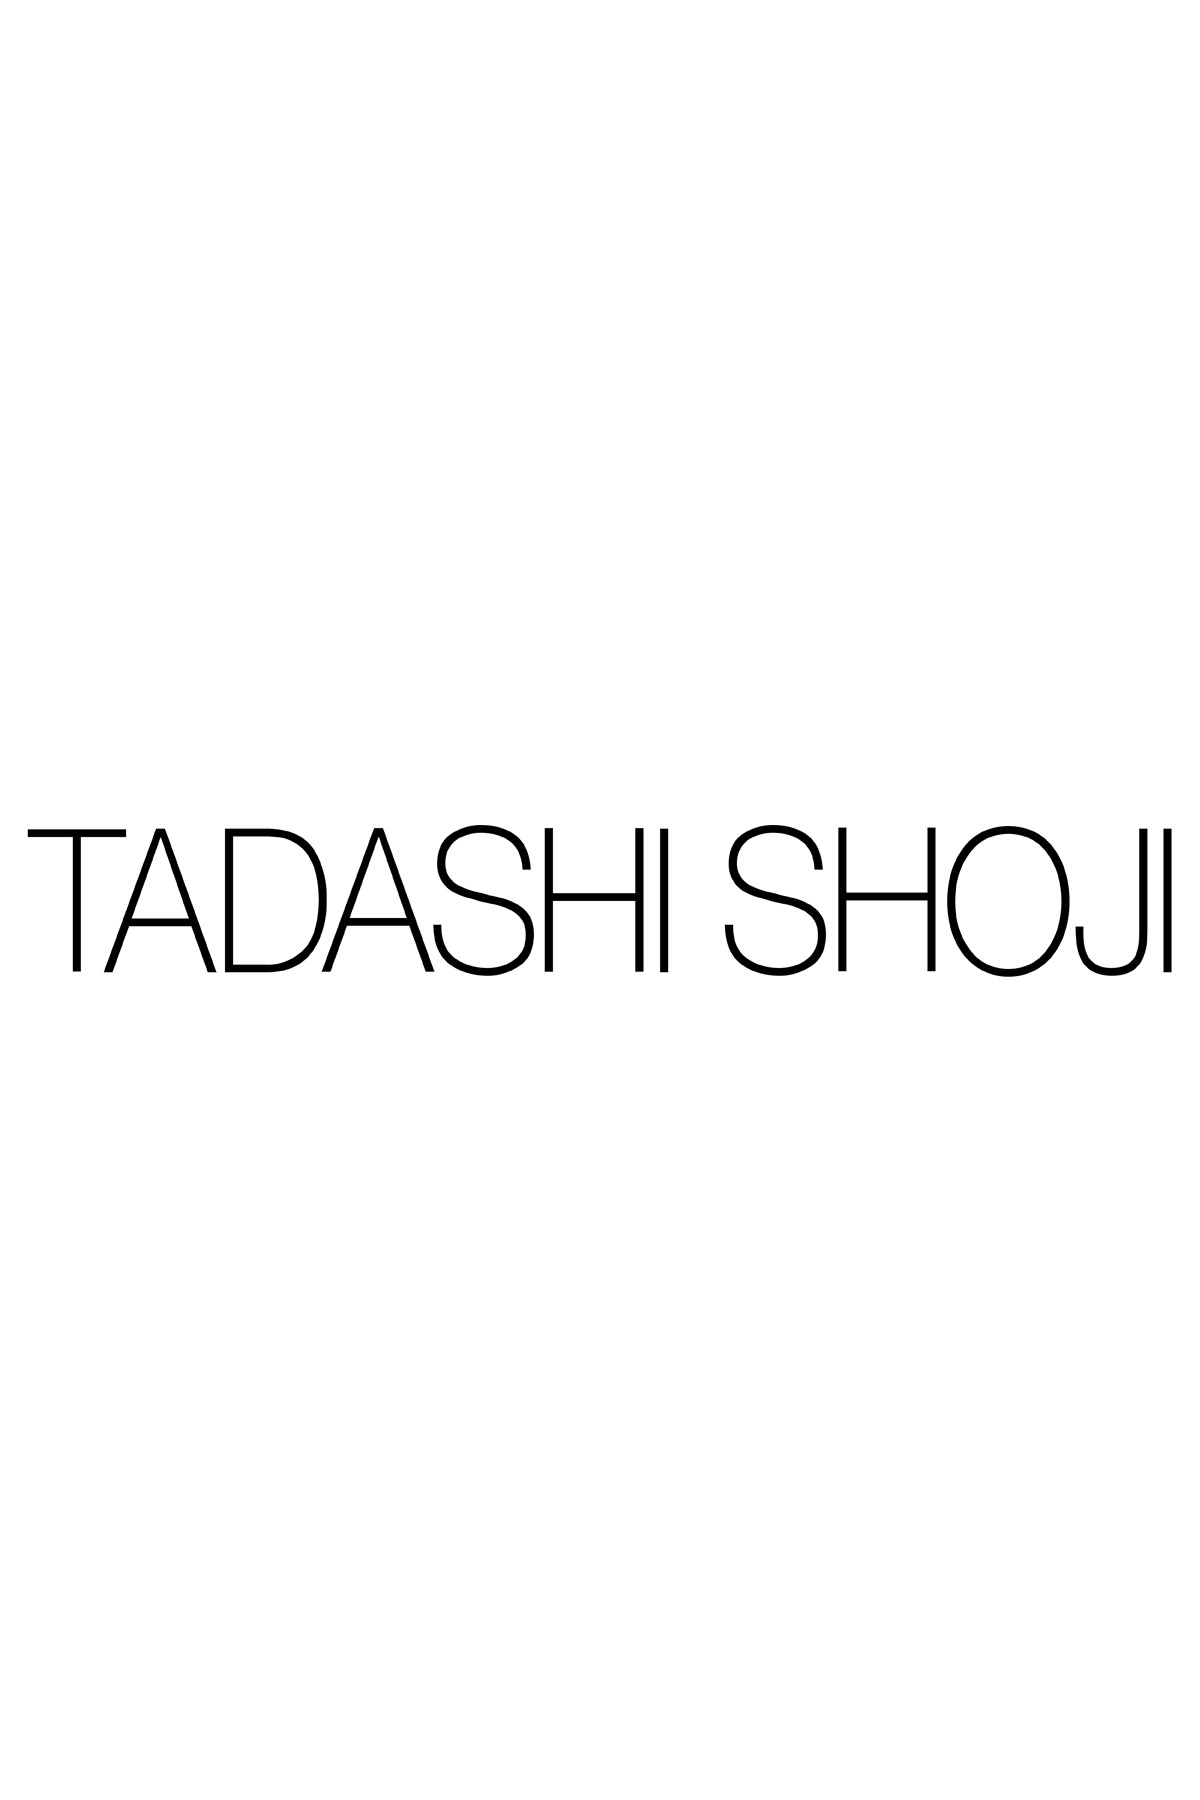 Tadashi Shoji x Bel Aire Bridal - Rhinestone Chandelier Earrings